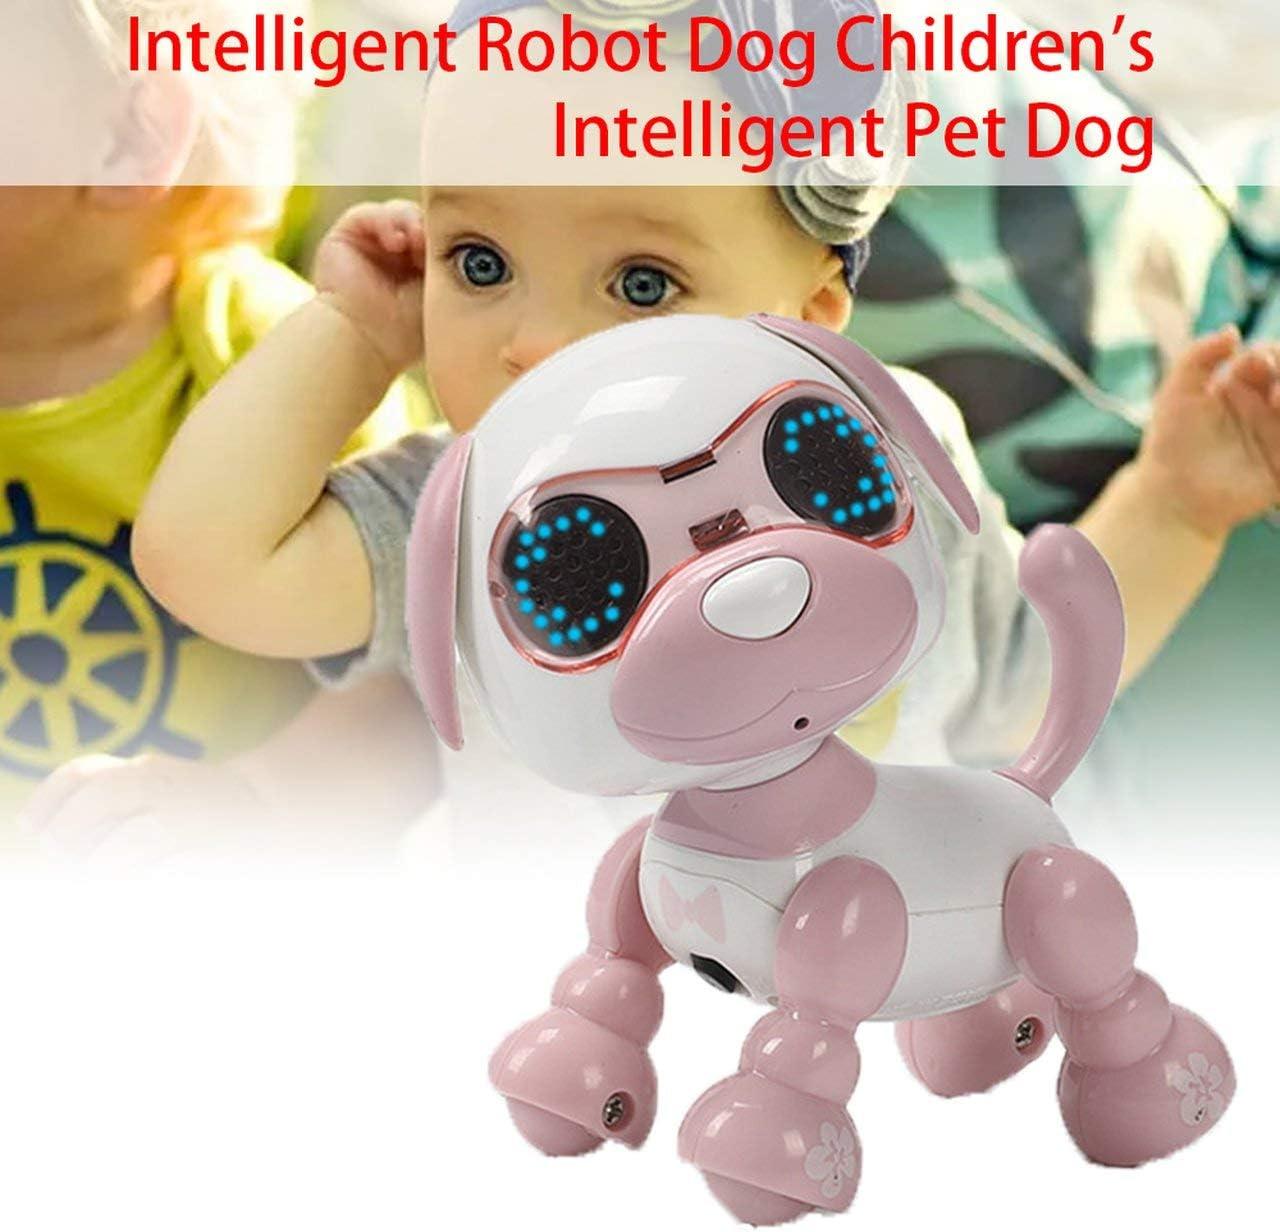 FRjasnyfall Smart Machine Dog Child Smart Pet Dog Induction Touch Electric Toy Puppy Intelligent Electronic Pet Fashion Blue